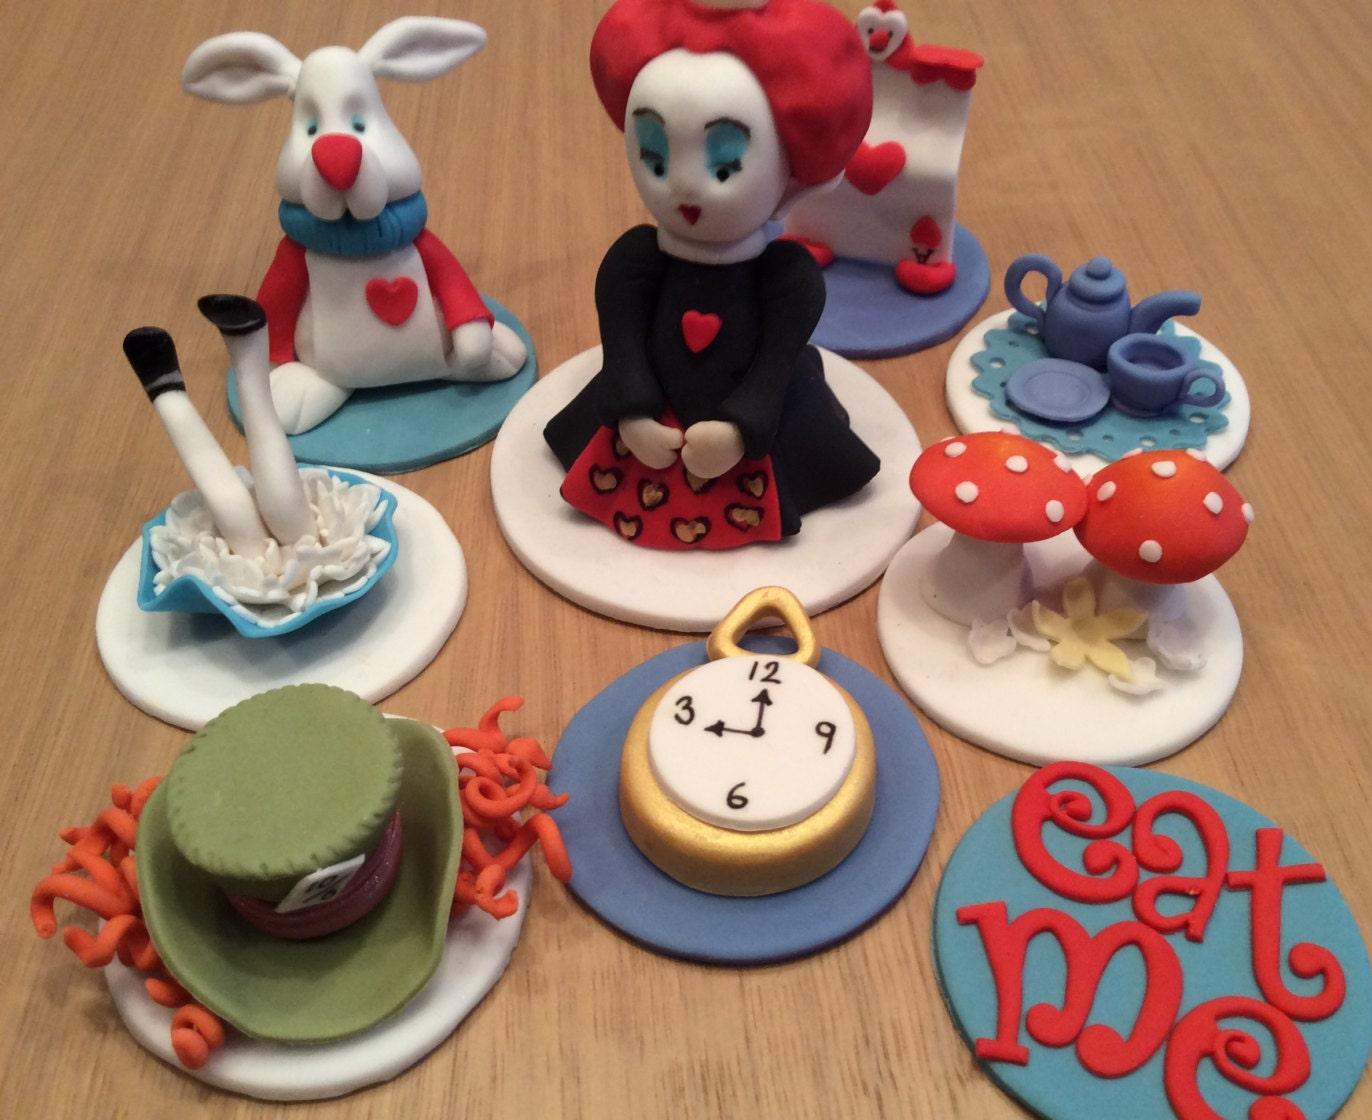 Edible Cake Decorations Alice In Wonderland : Edible icing Alice in Wonderland Cake by SweetbyDesignToppers